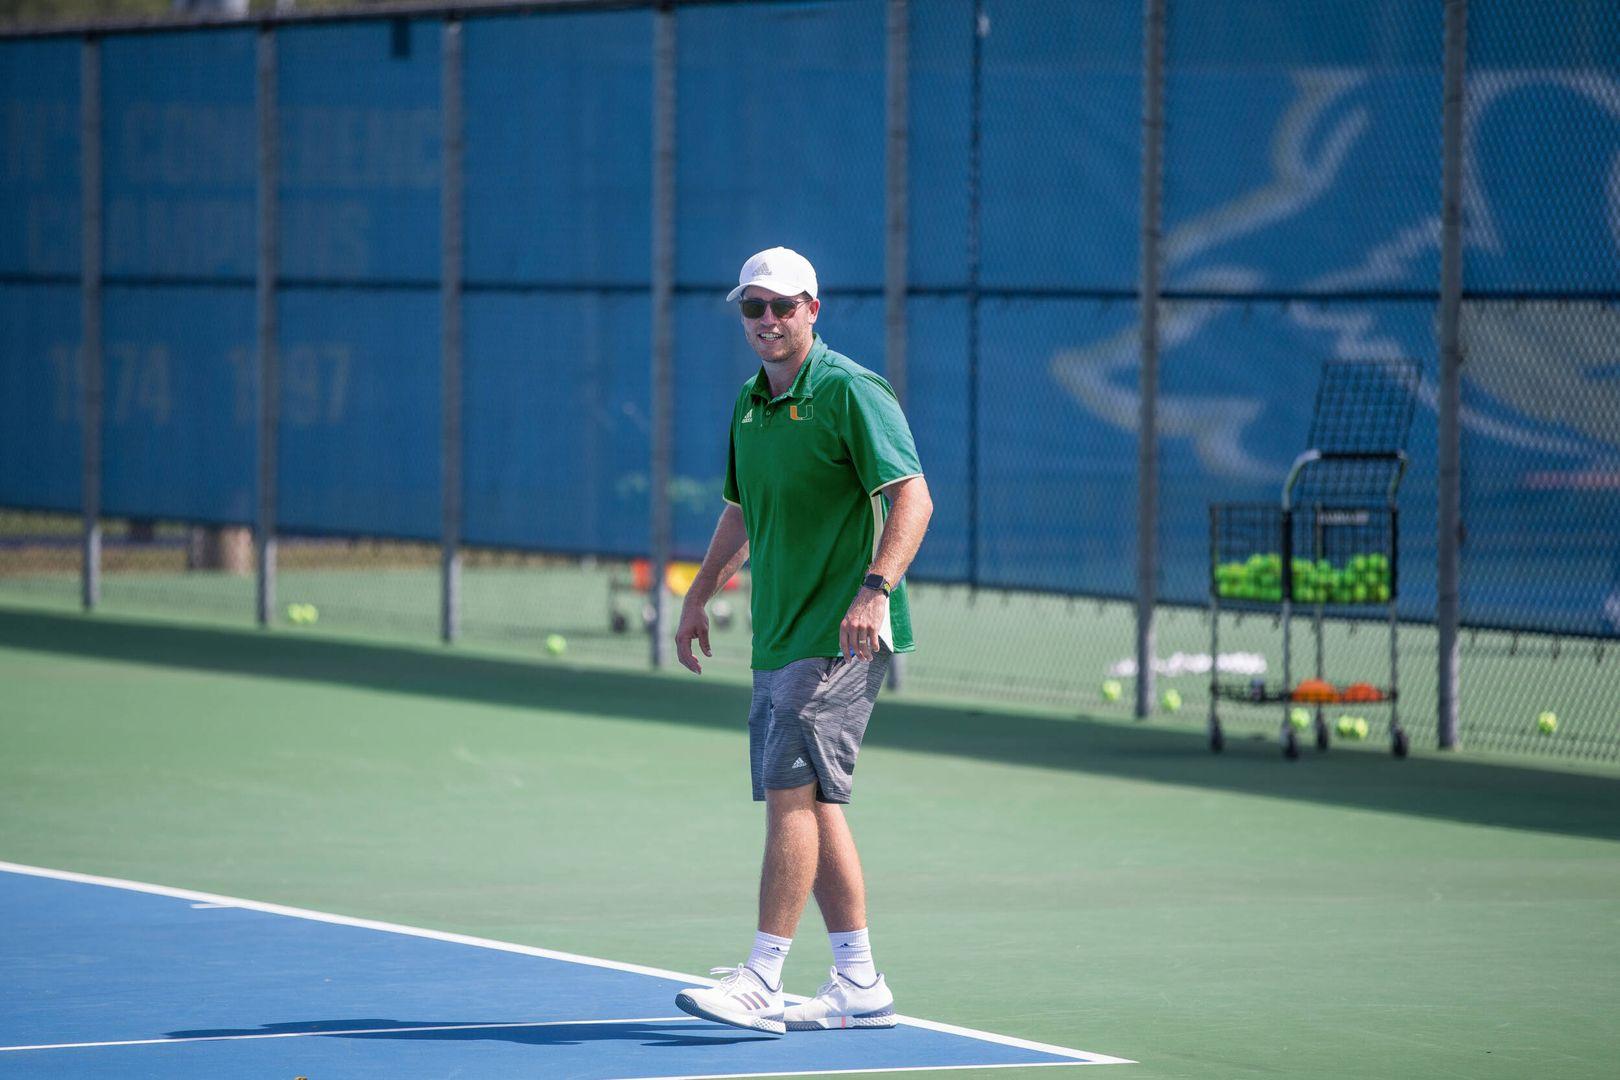 Darragh Glavin Named Assistant Men's Tennis Coach